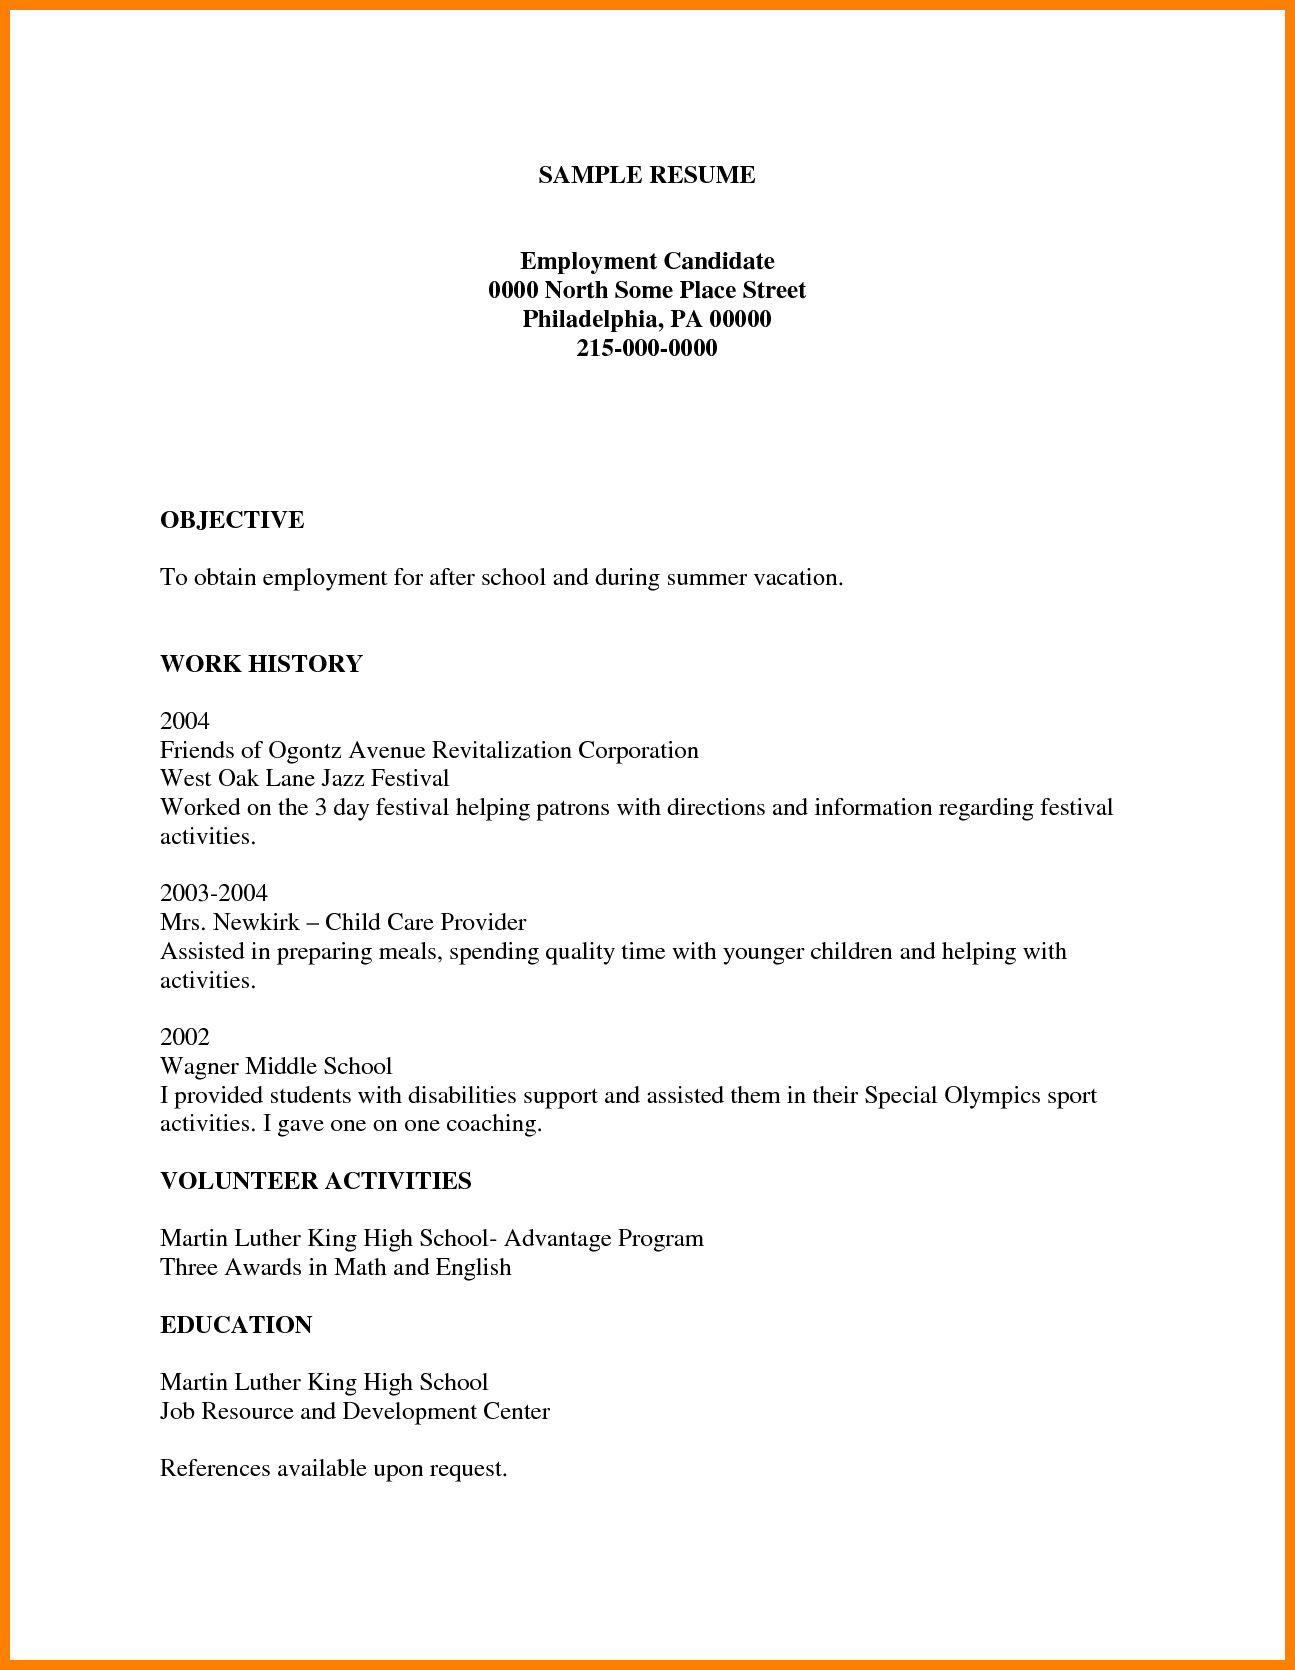 13 Free Resume Templates | 3-Free Resume Templates | Pinterest - Free Online Resume Templates Printable